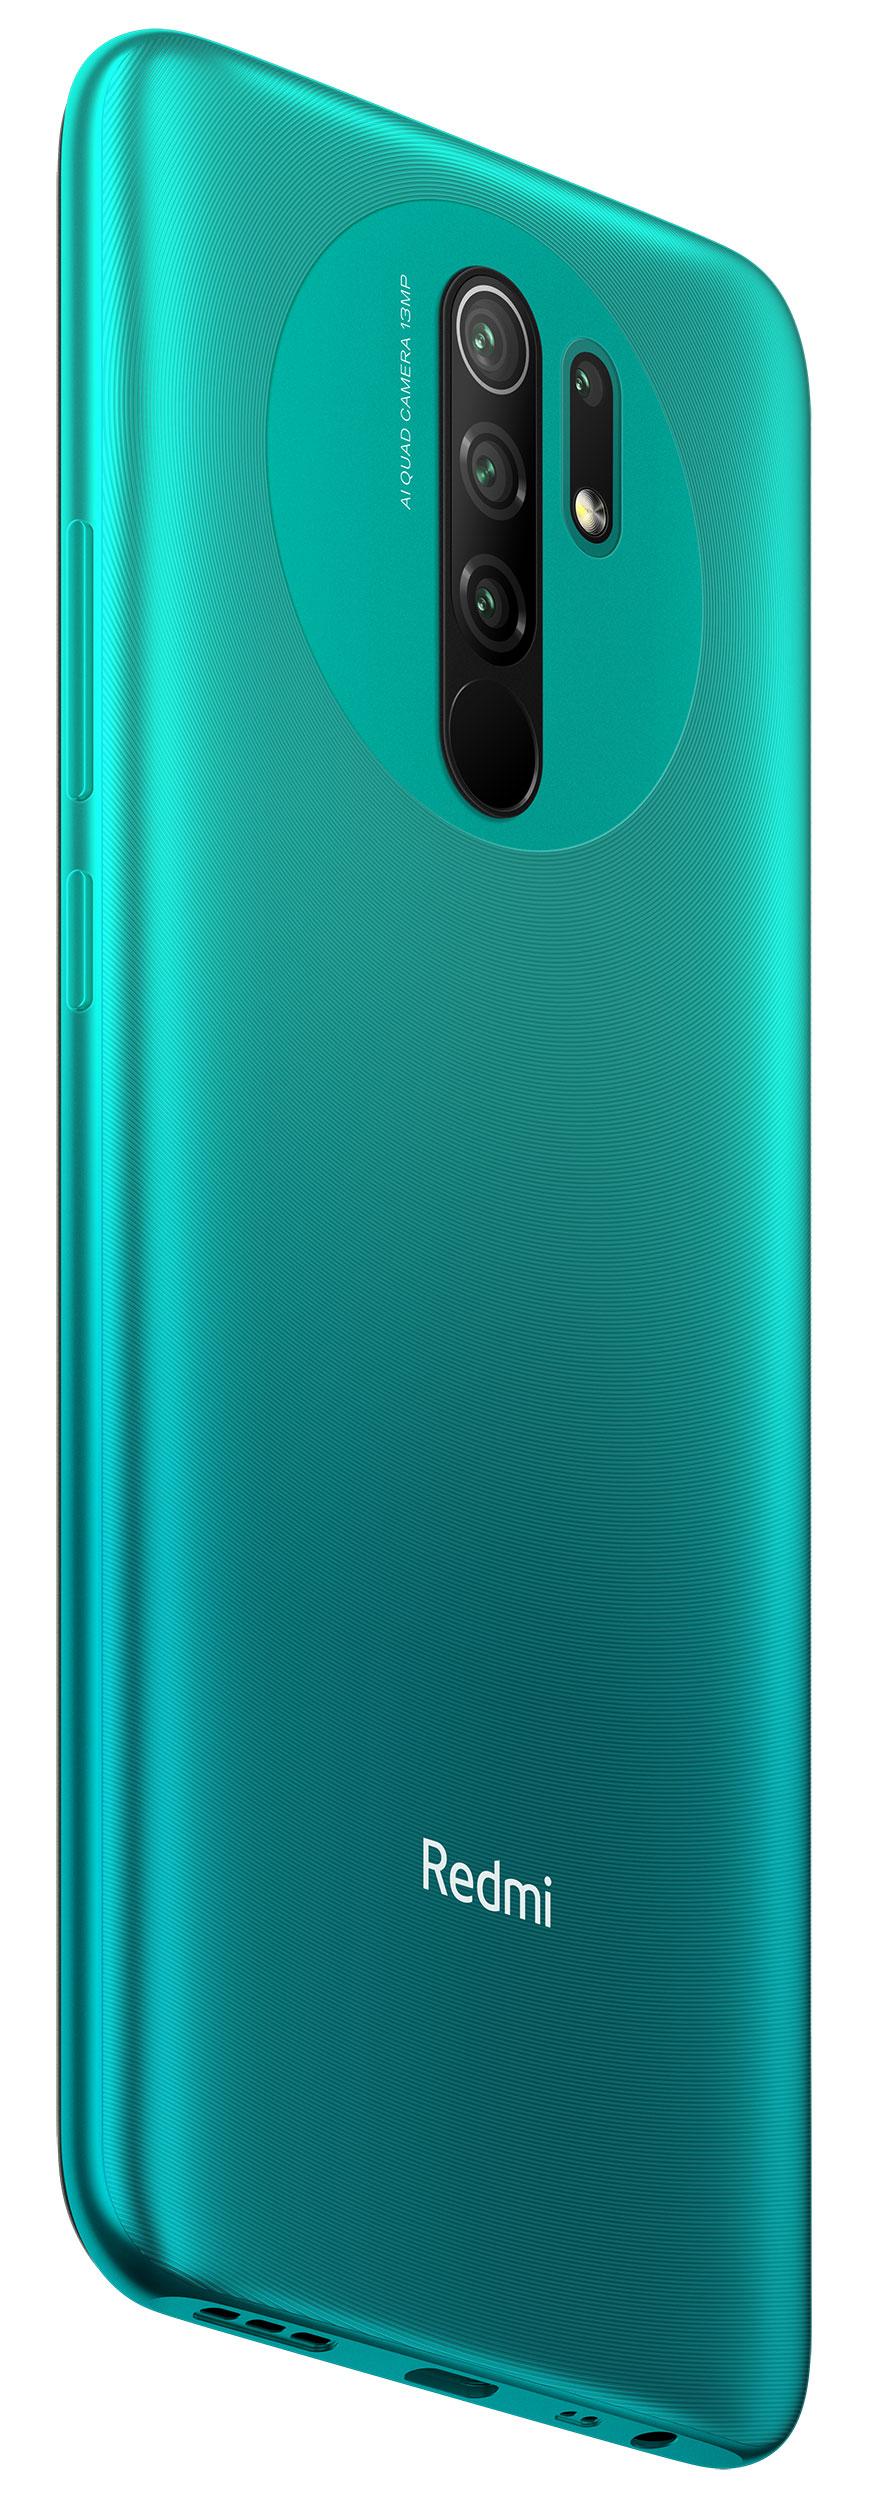 Smartphone Redmi 9 - Global - 3+32GB - Verde